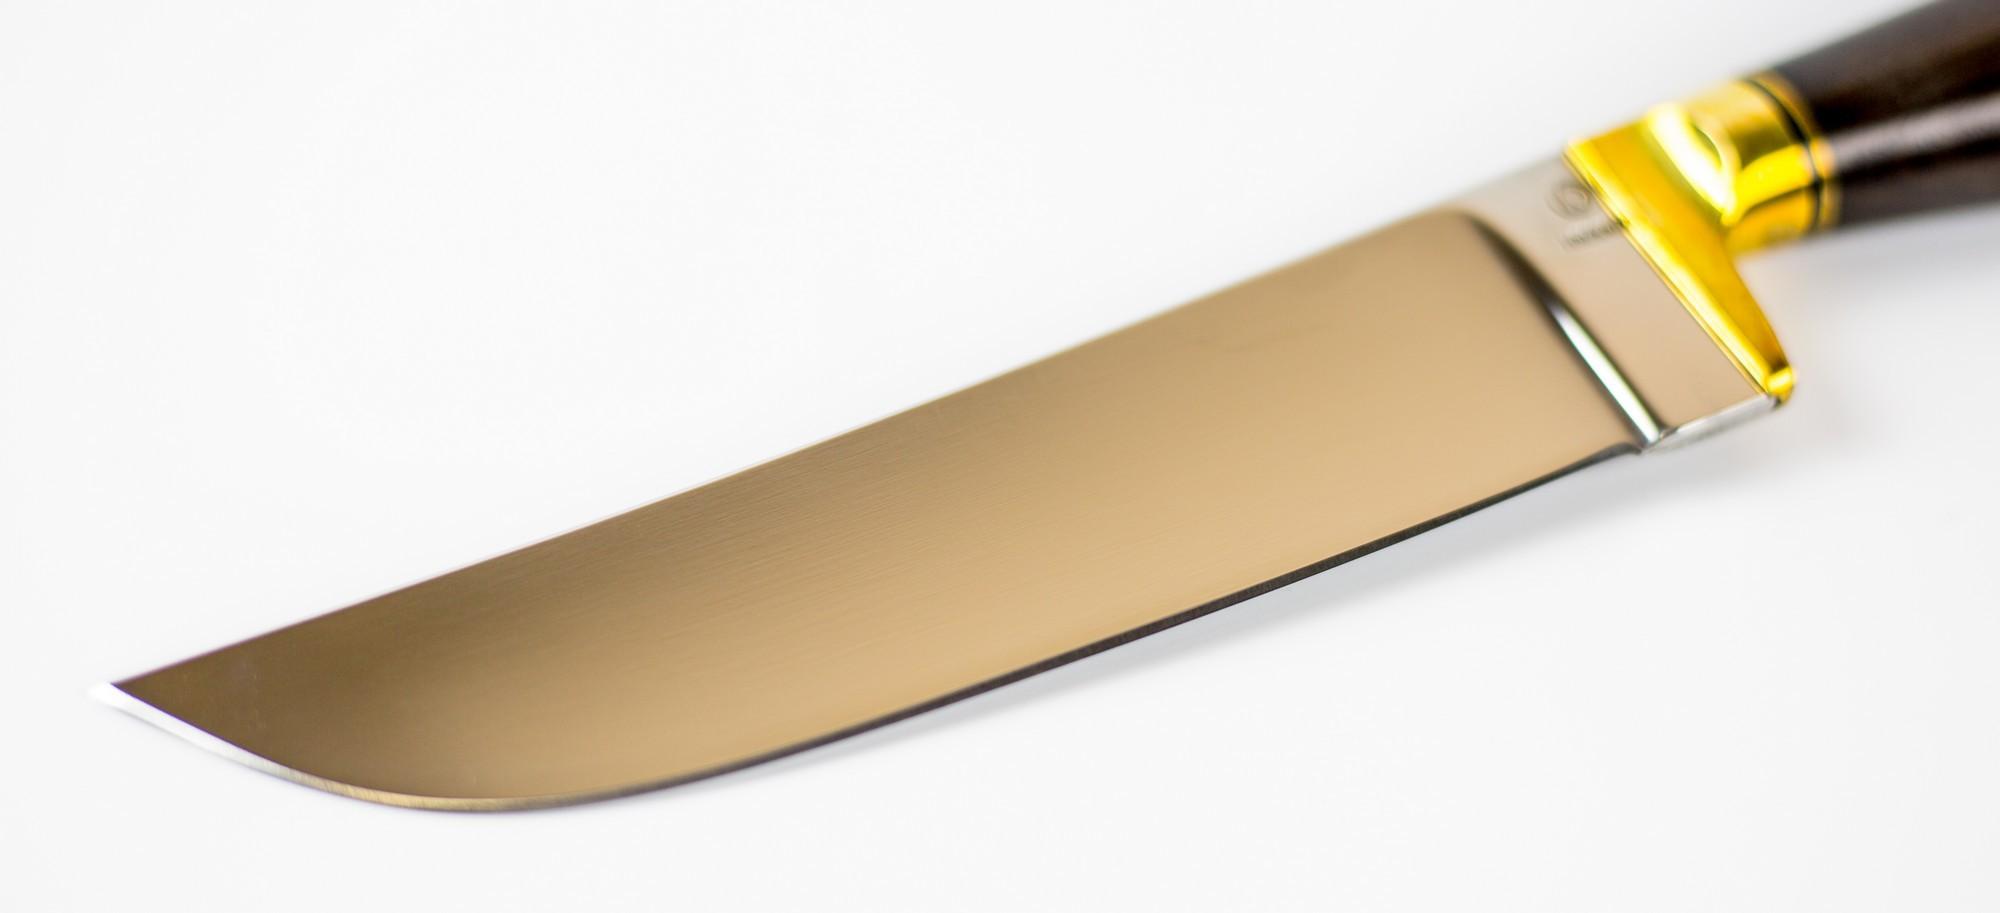 Фото 3 - Нож Узбек, сталь 110х18 от Ножи Крутова